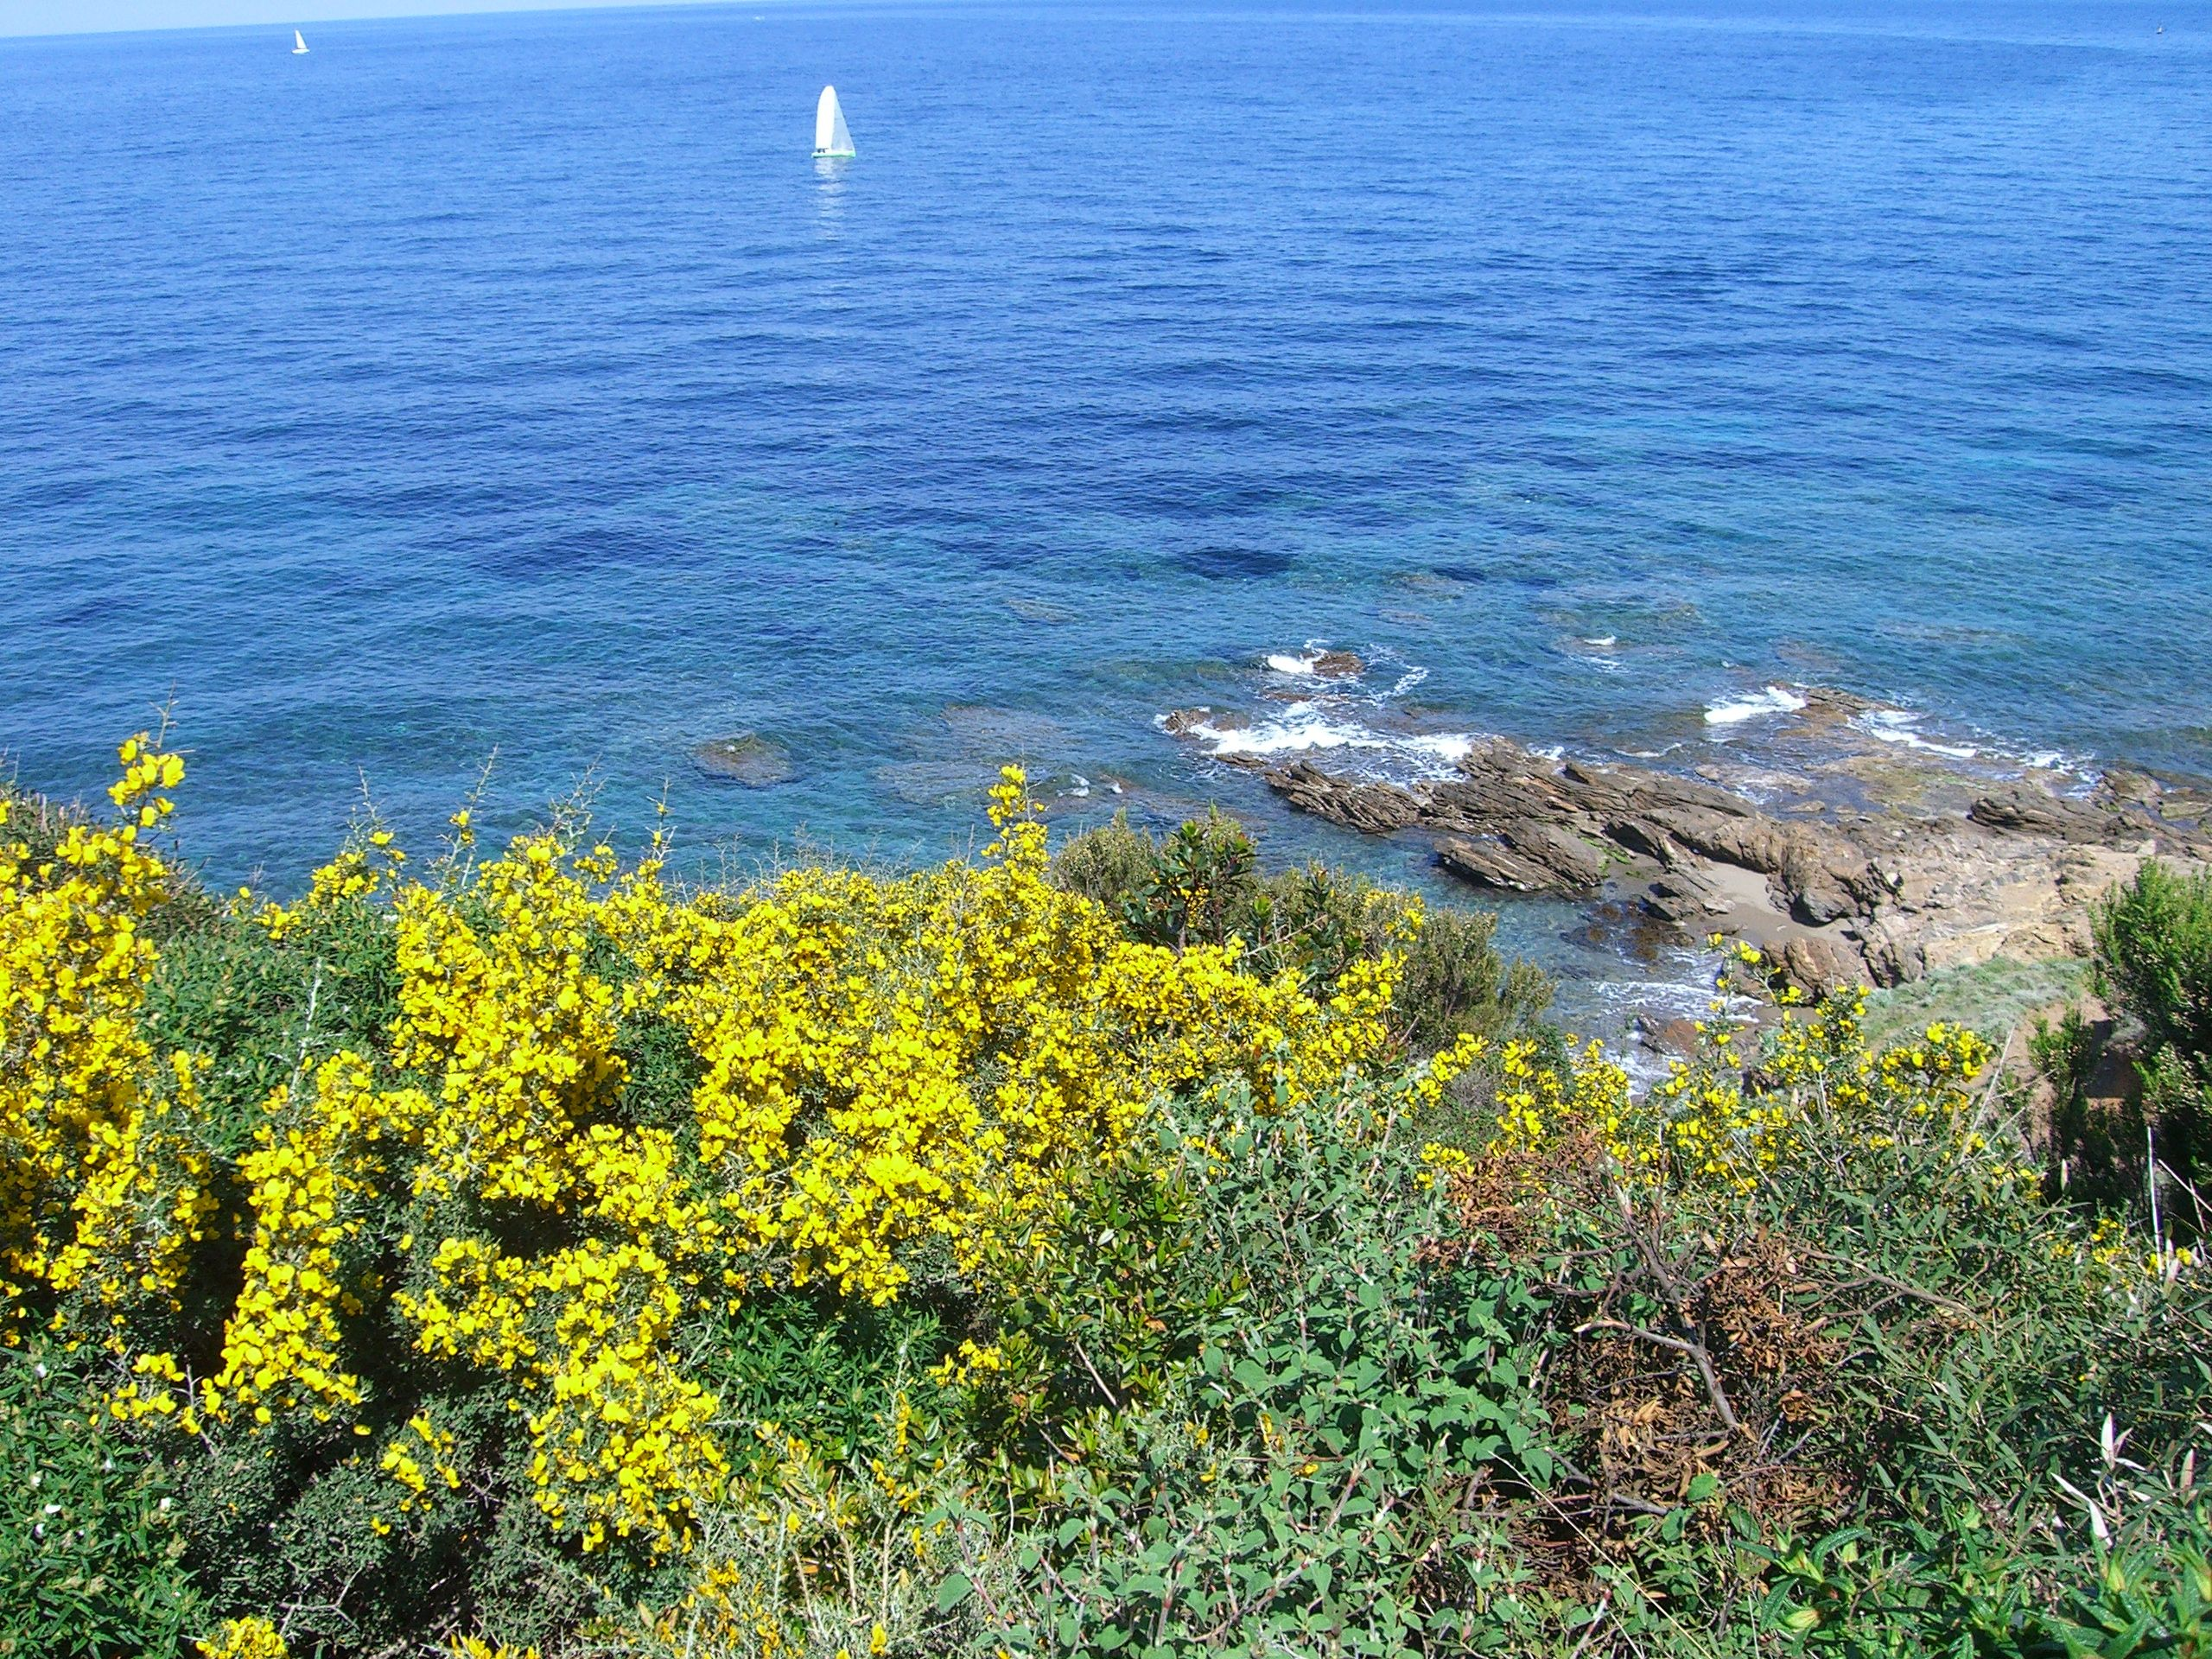 Fleurs de bord de mer dans le cap corse